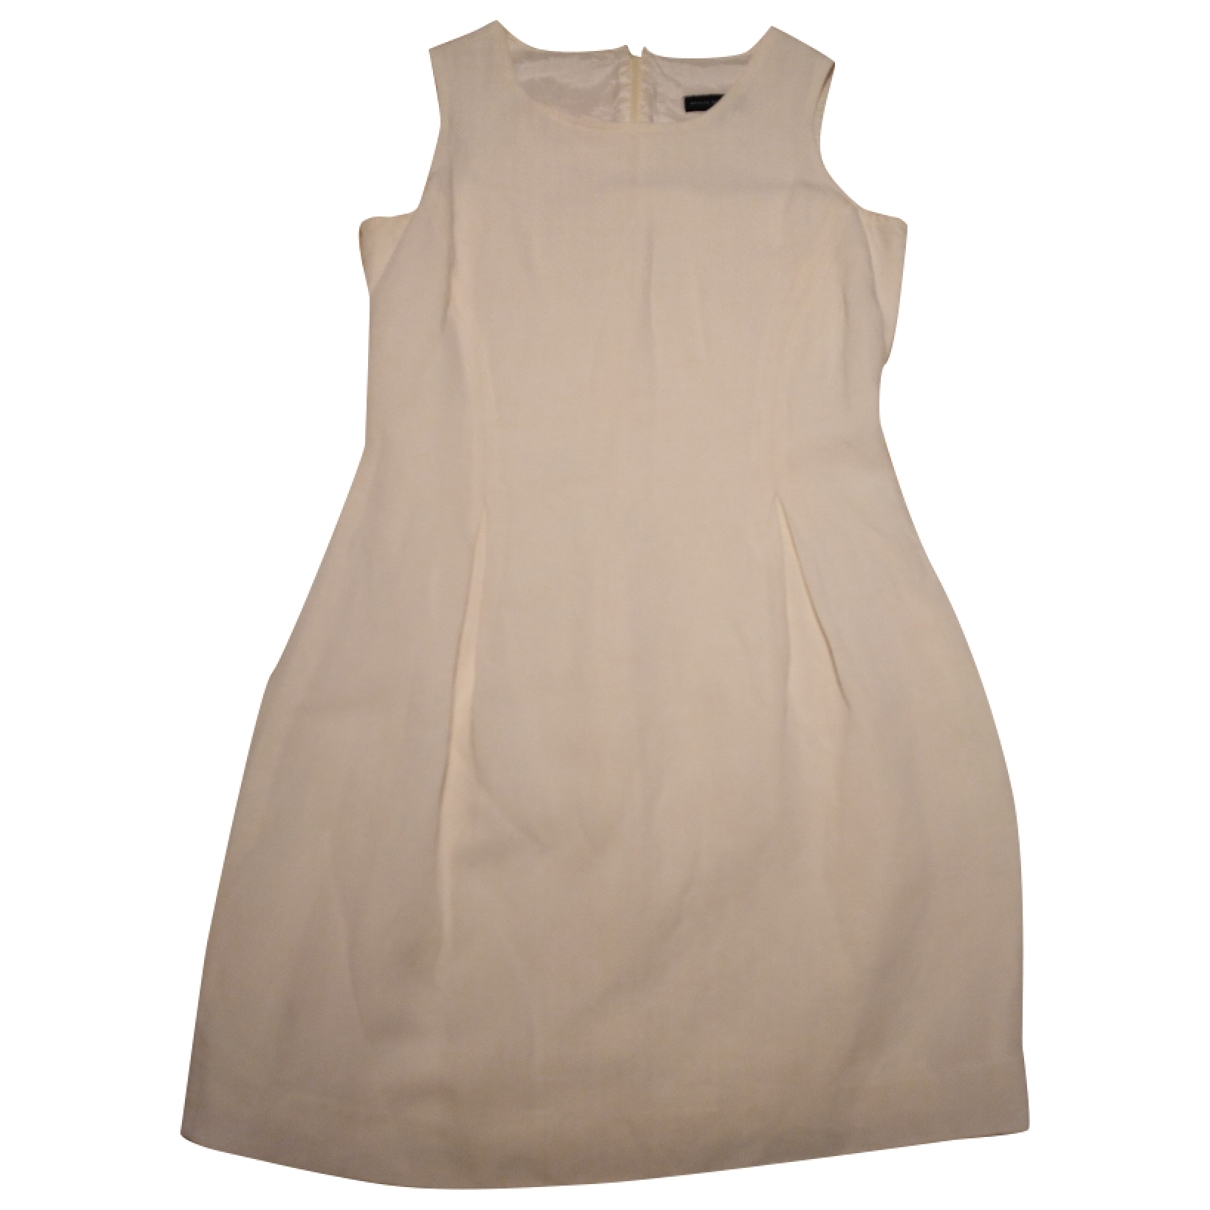 Adolfo Dominguez \N Ecru Linen dress for Women 38 FR